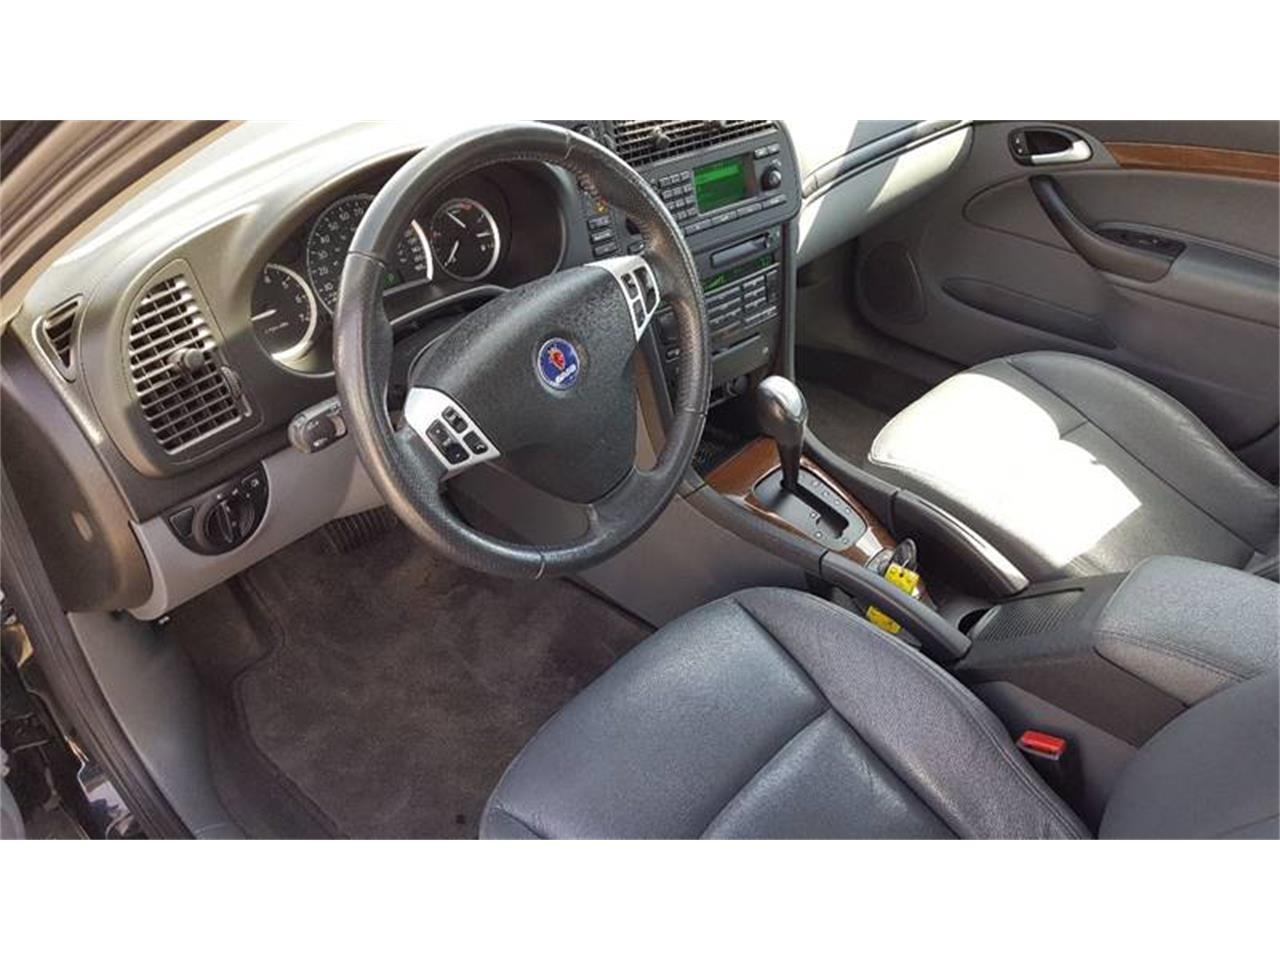 2006 Saab 9-3 (CC-1010920) for sale in Effingham, Illinois